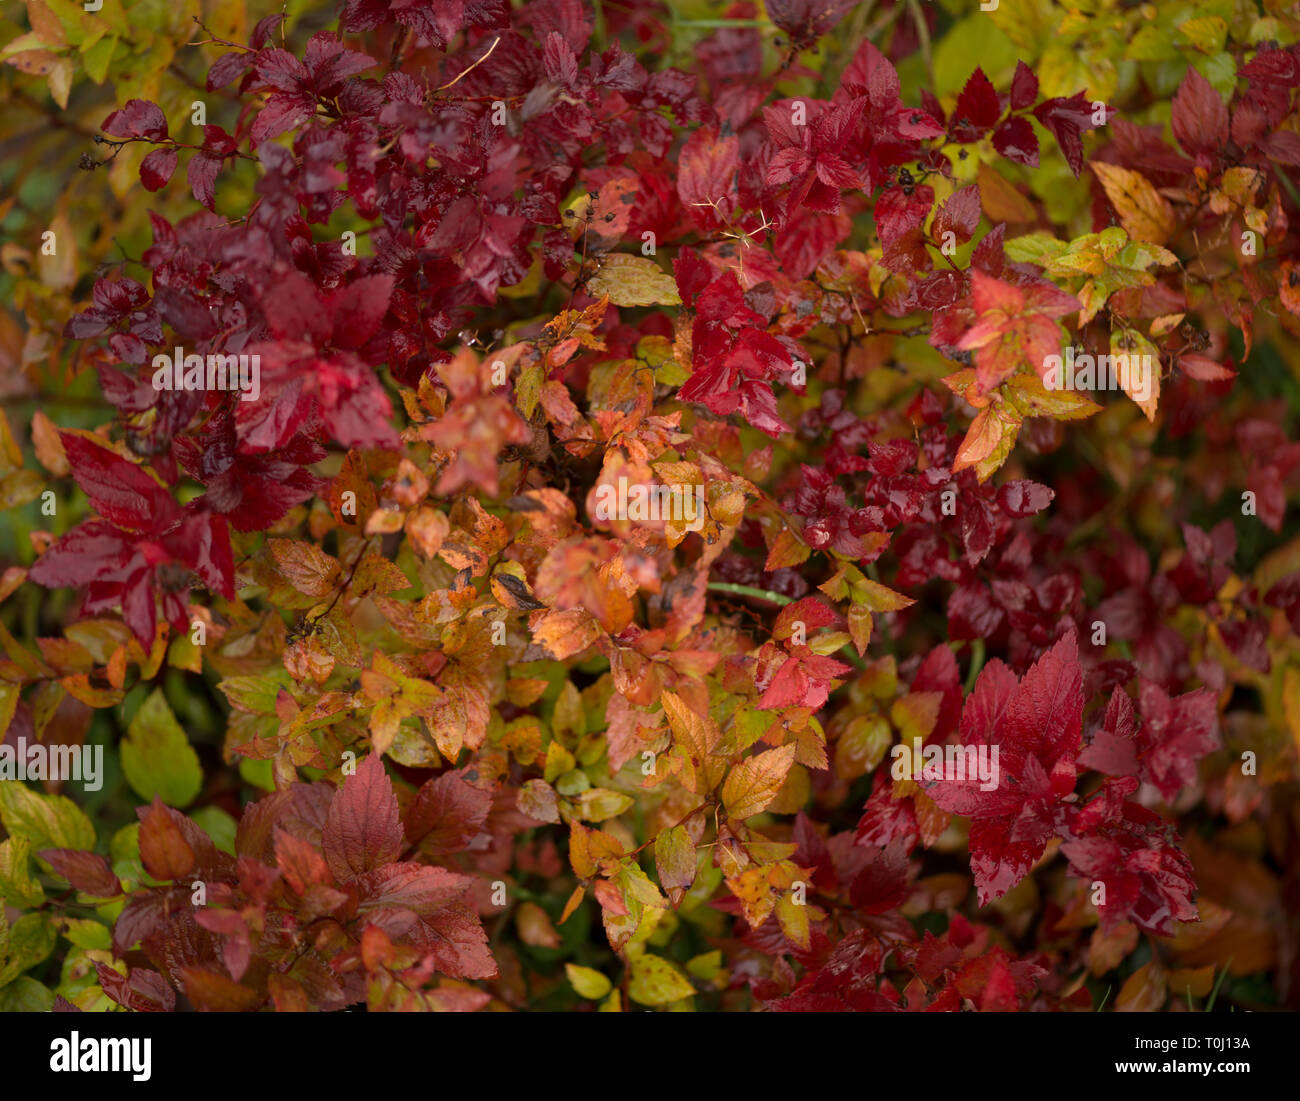 Plants in Sweden - Stock Image